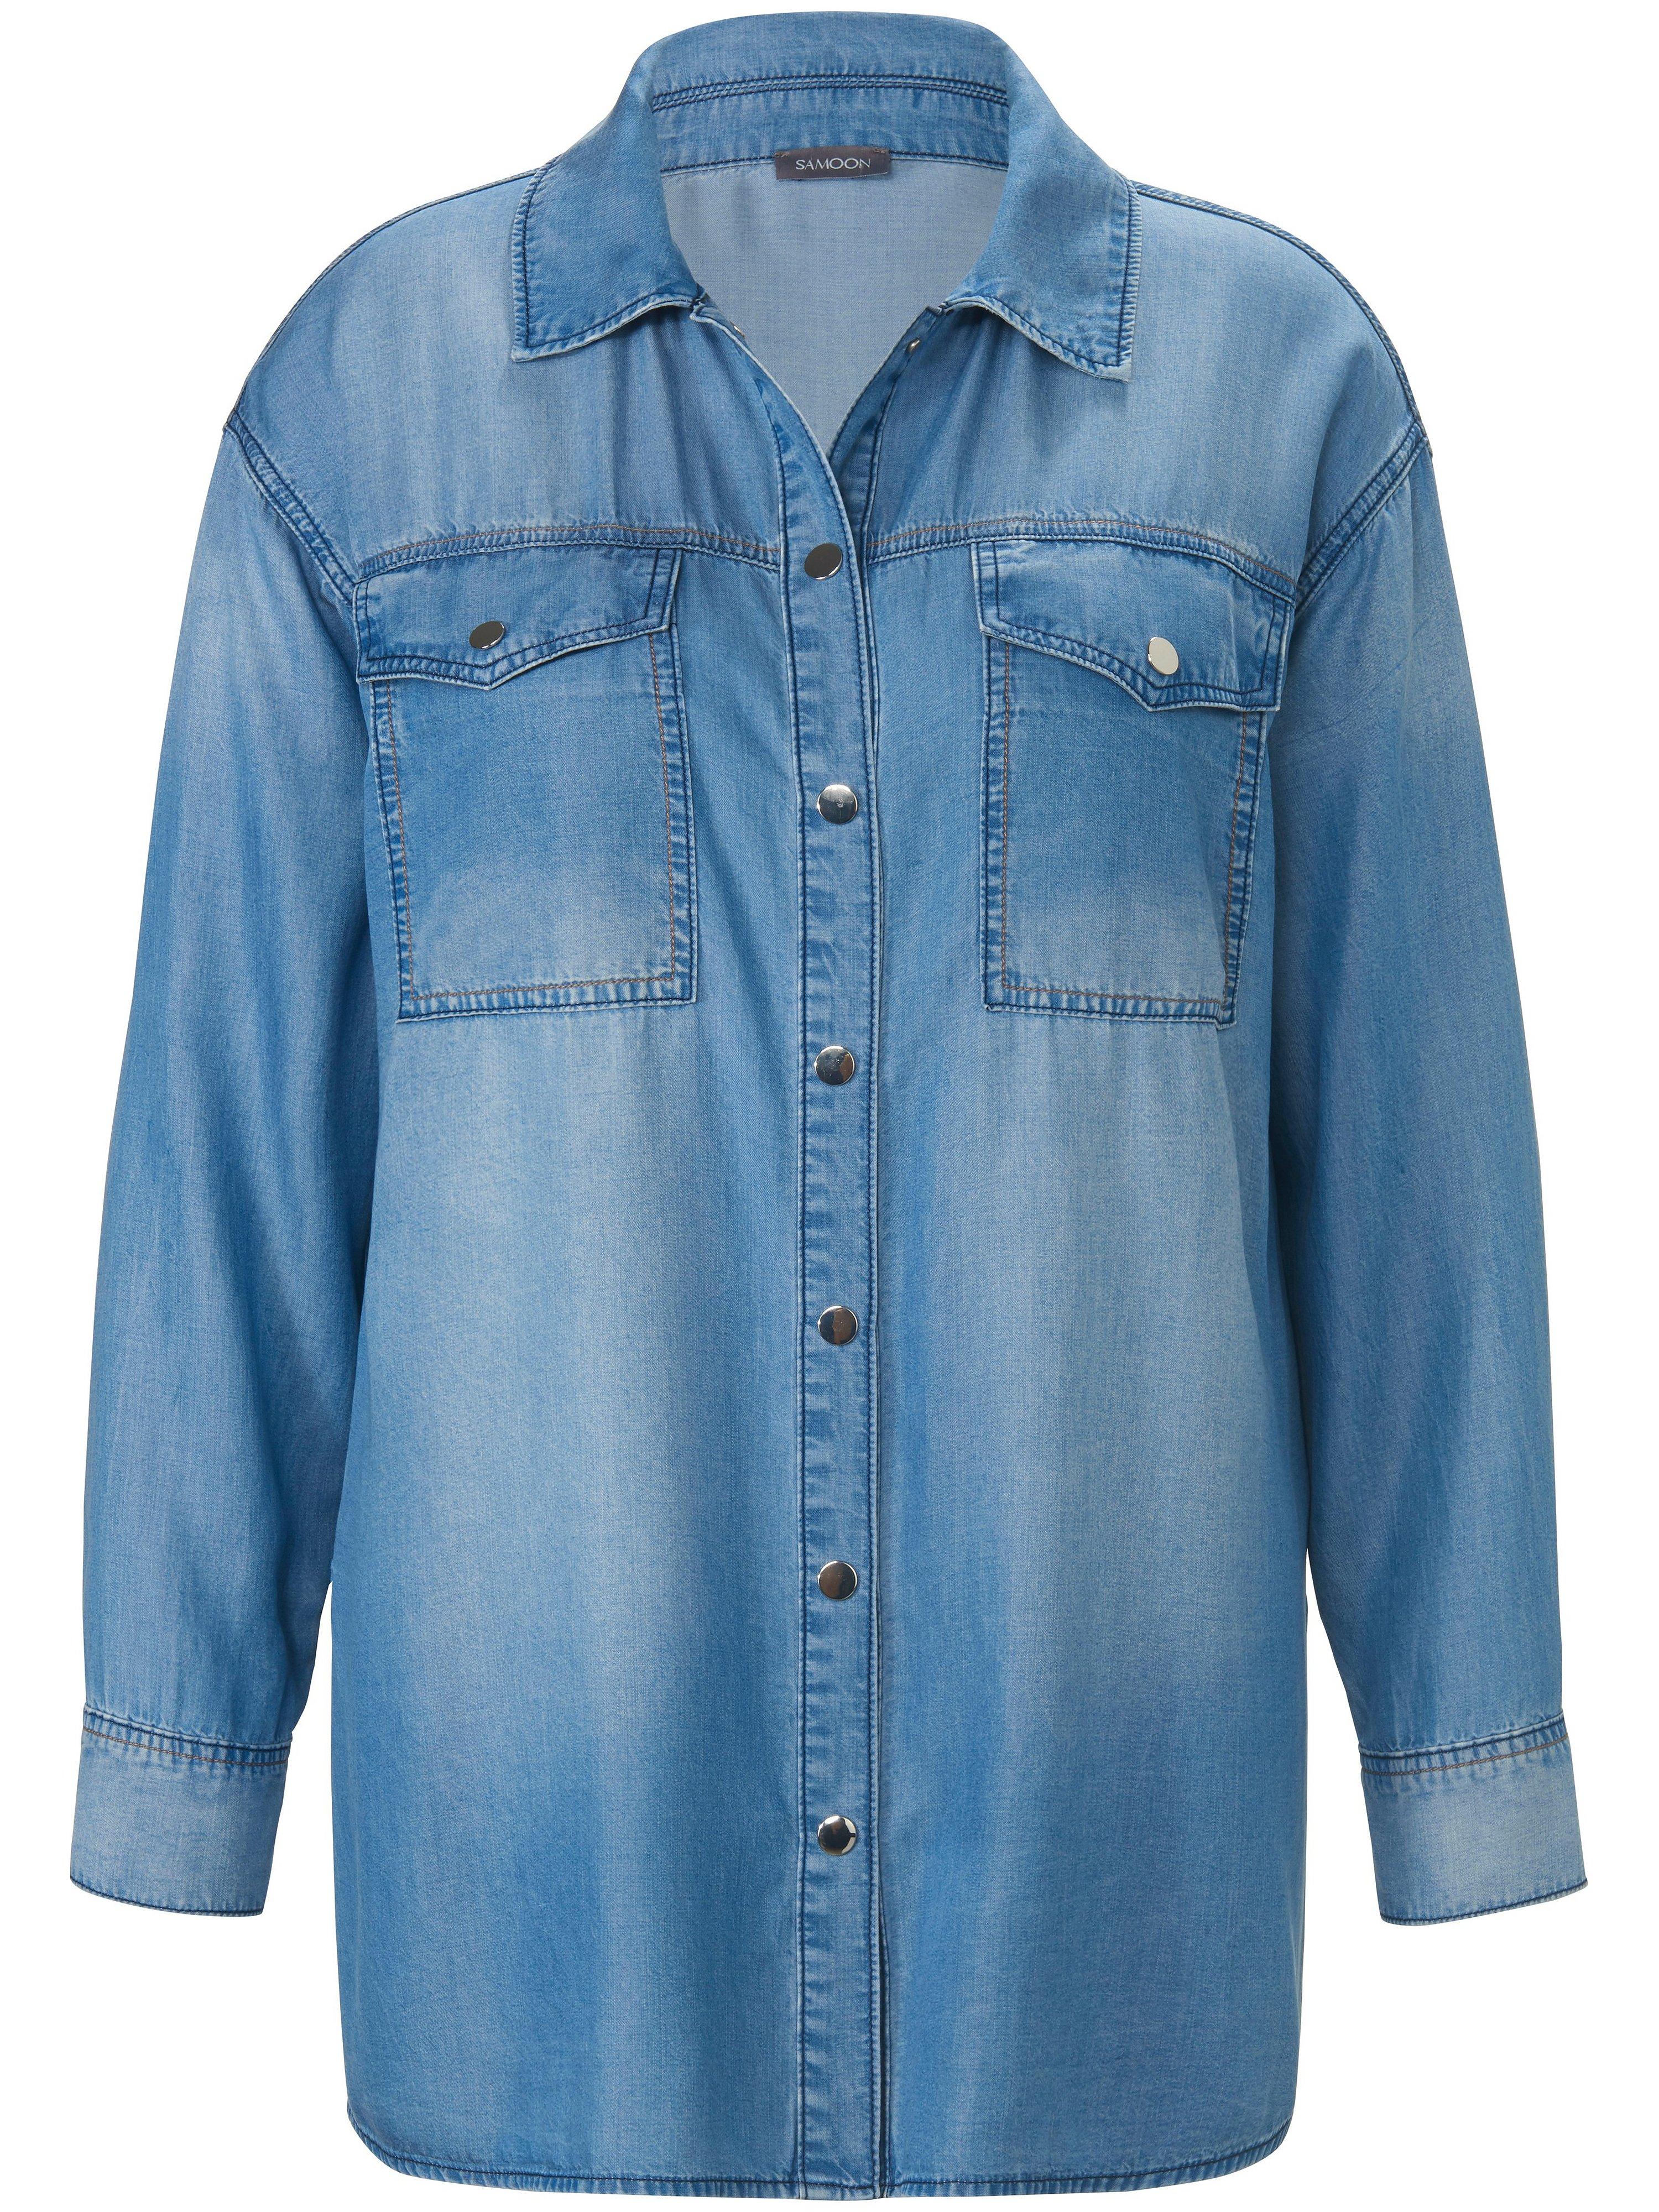 Jeansoverhemd lange mouwen Van Samoon blauw